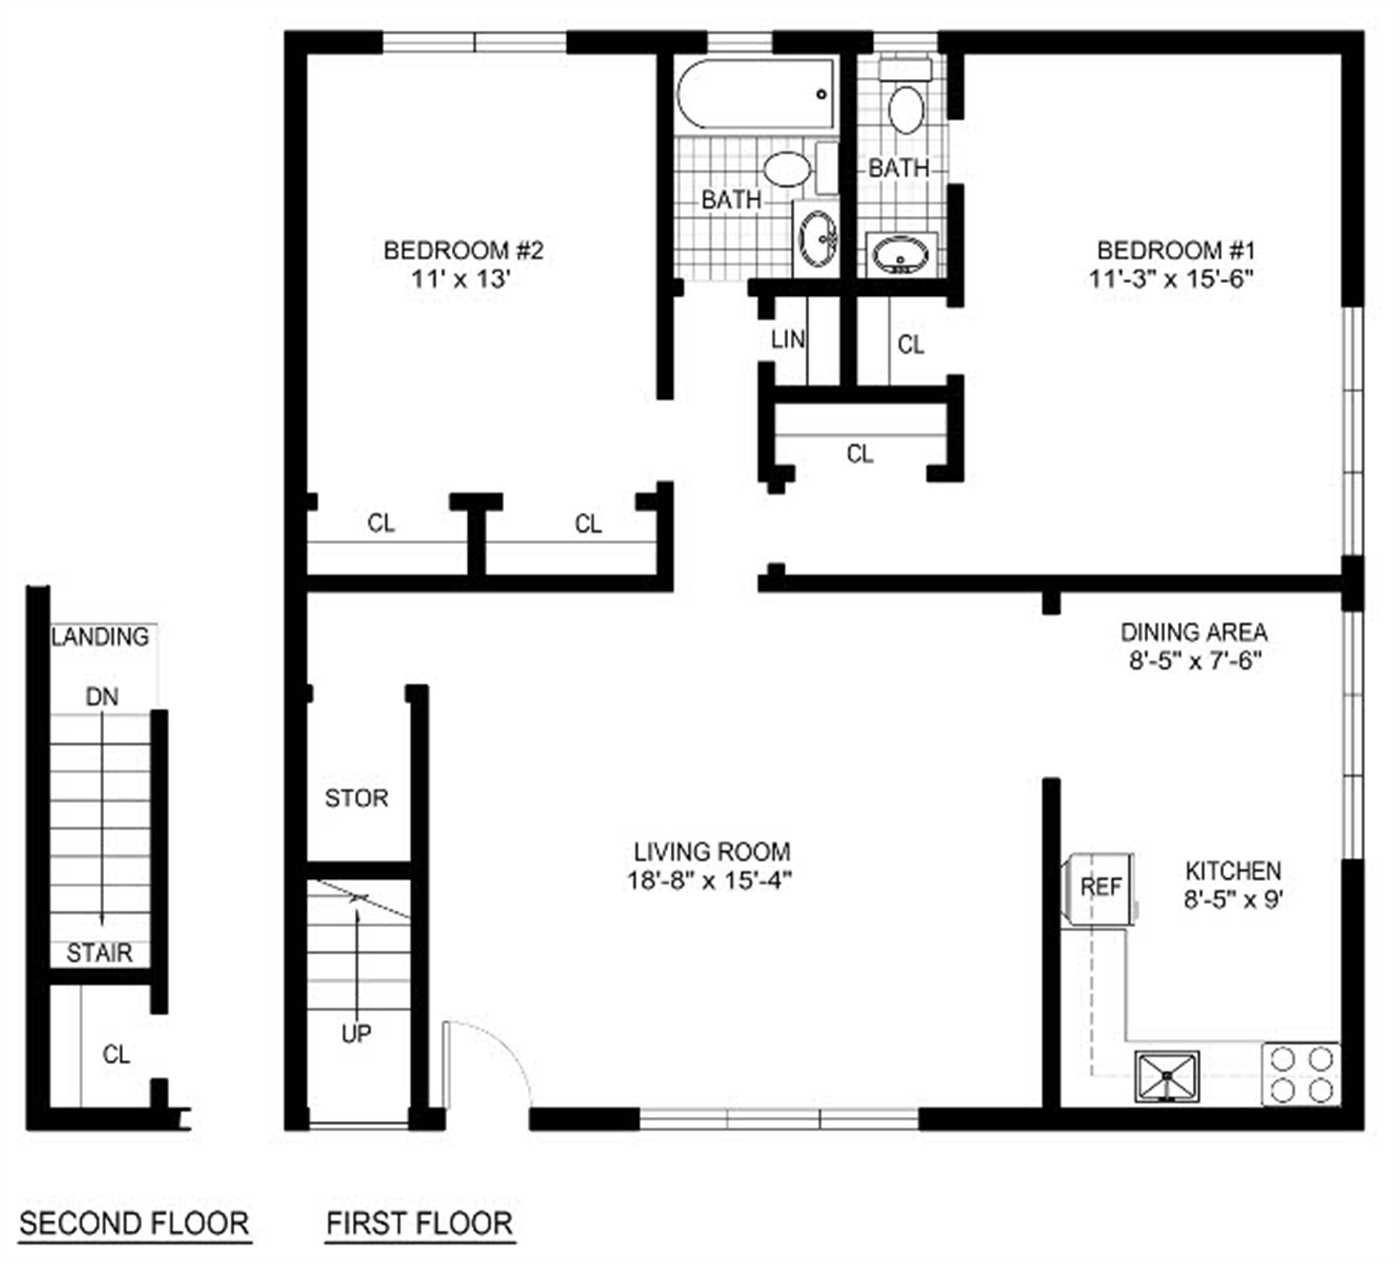 Bathroom Design Templates Free : Bathroom floor plan furniture templates bed